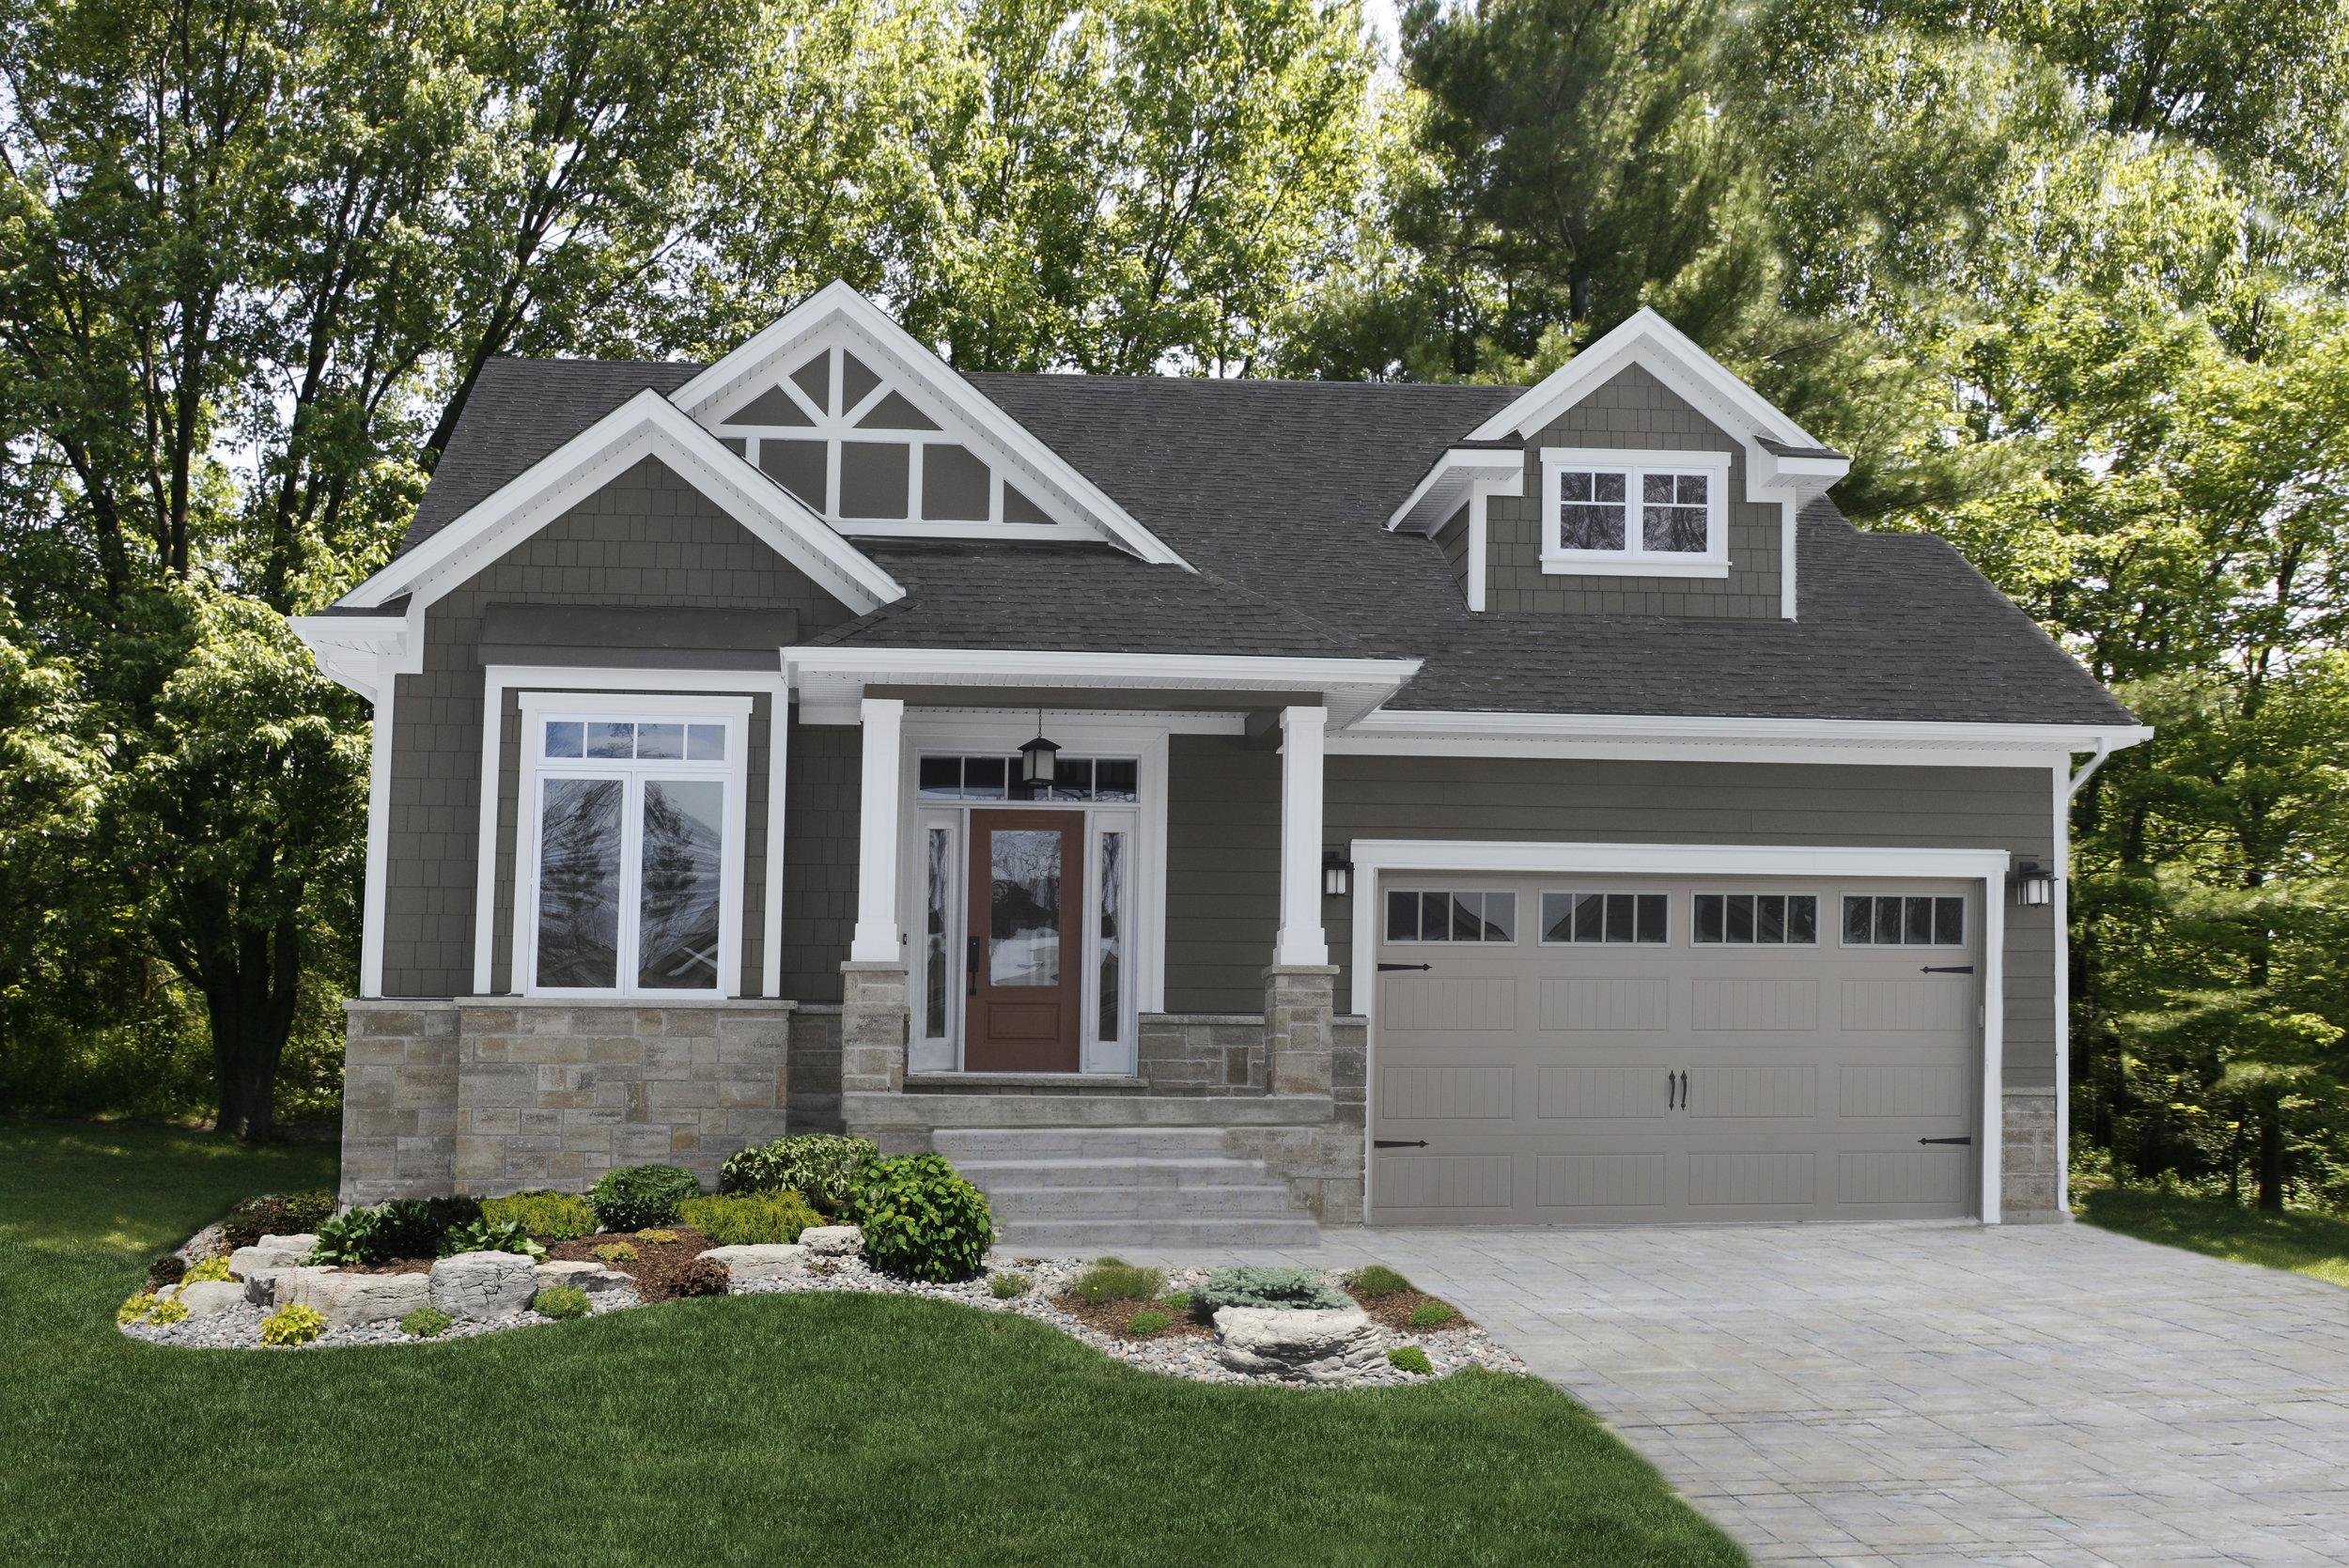 2014 - Medway Homes Inc.